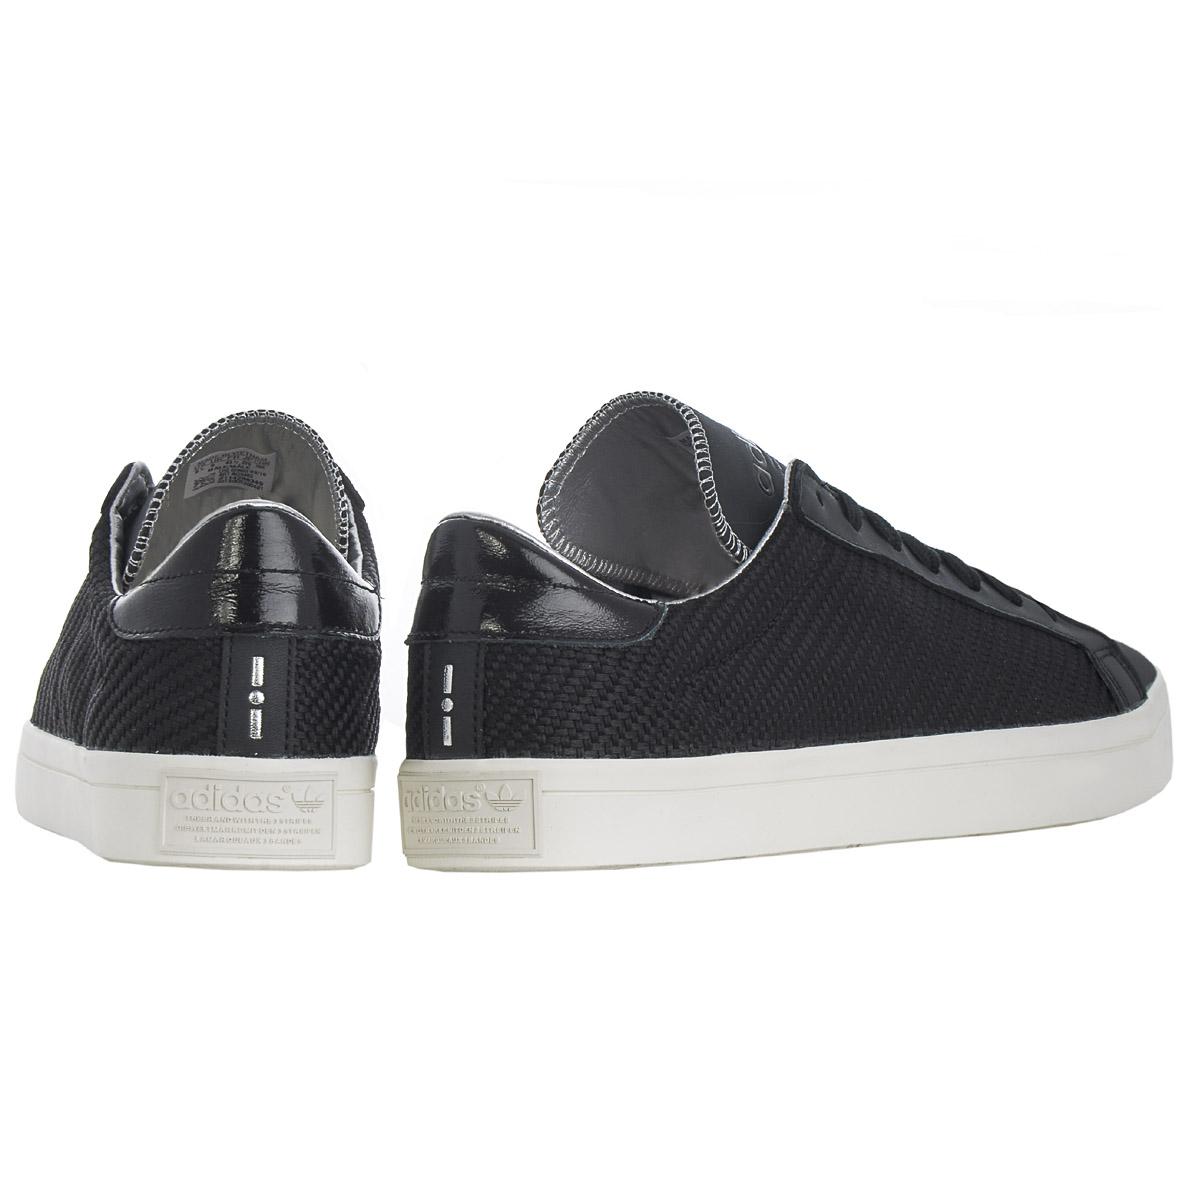 Adidas Alphabounce ⋆ Online Sale Shop ⋆ Te Apasionados